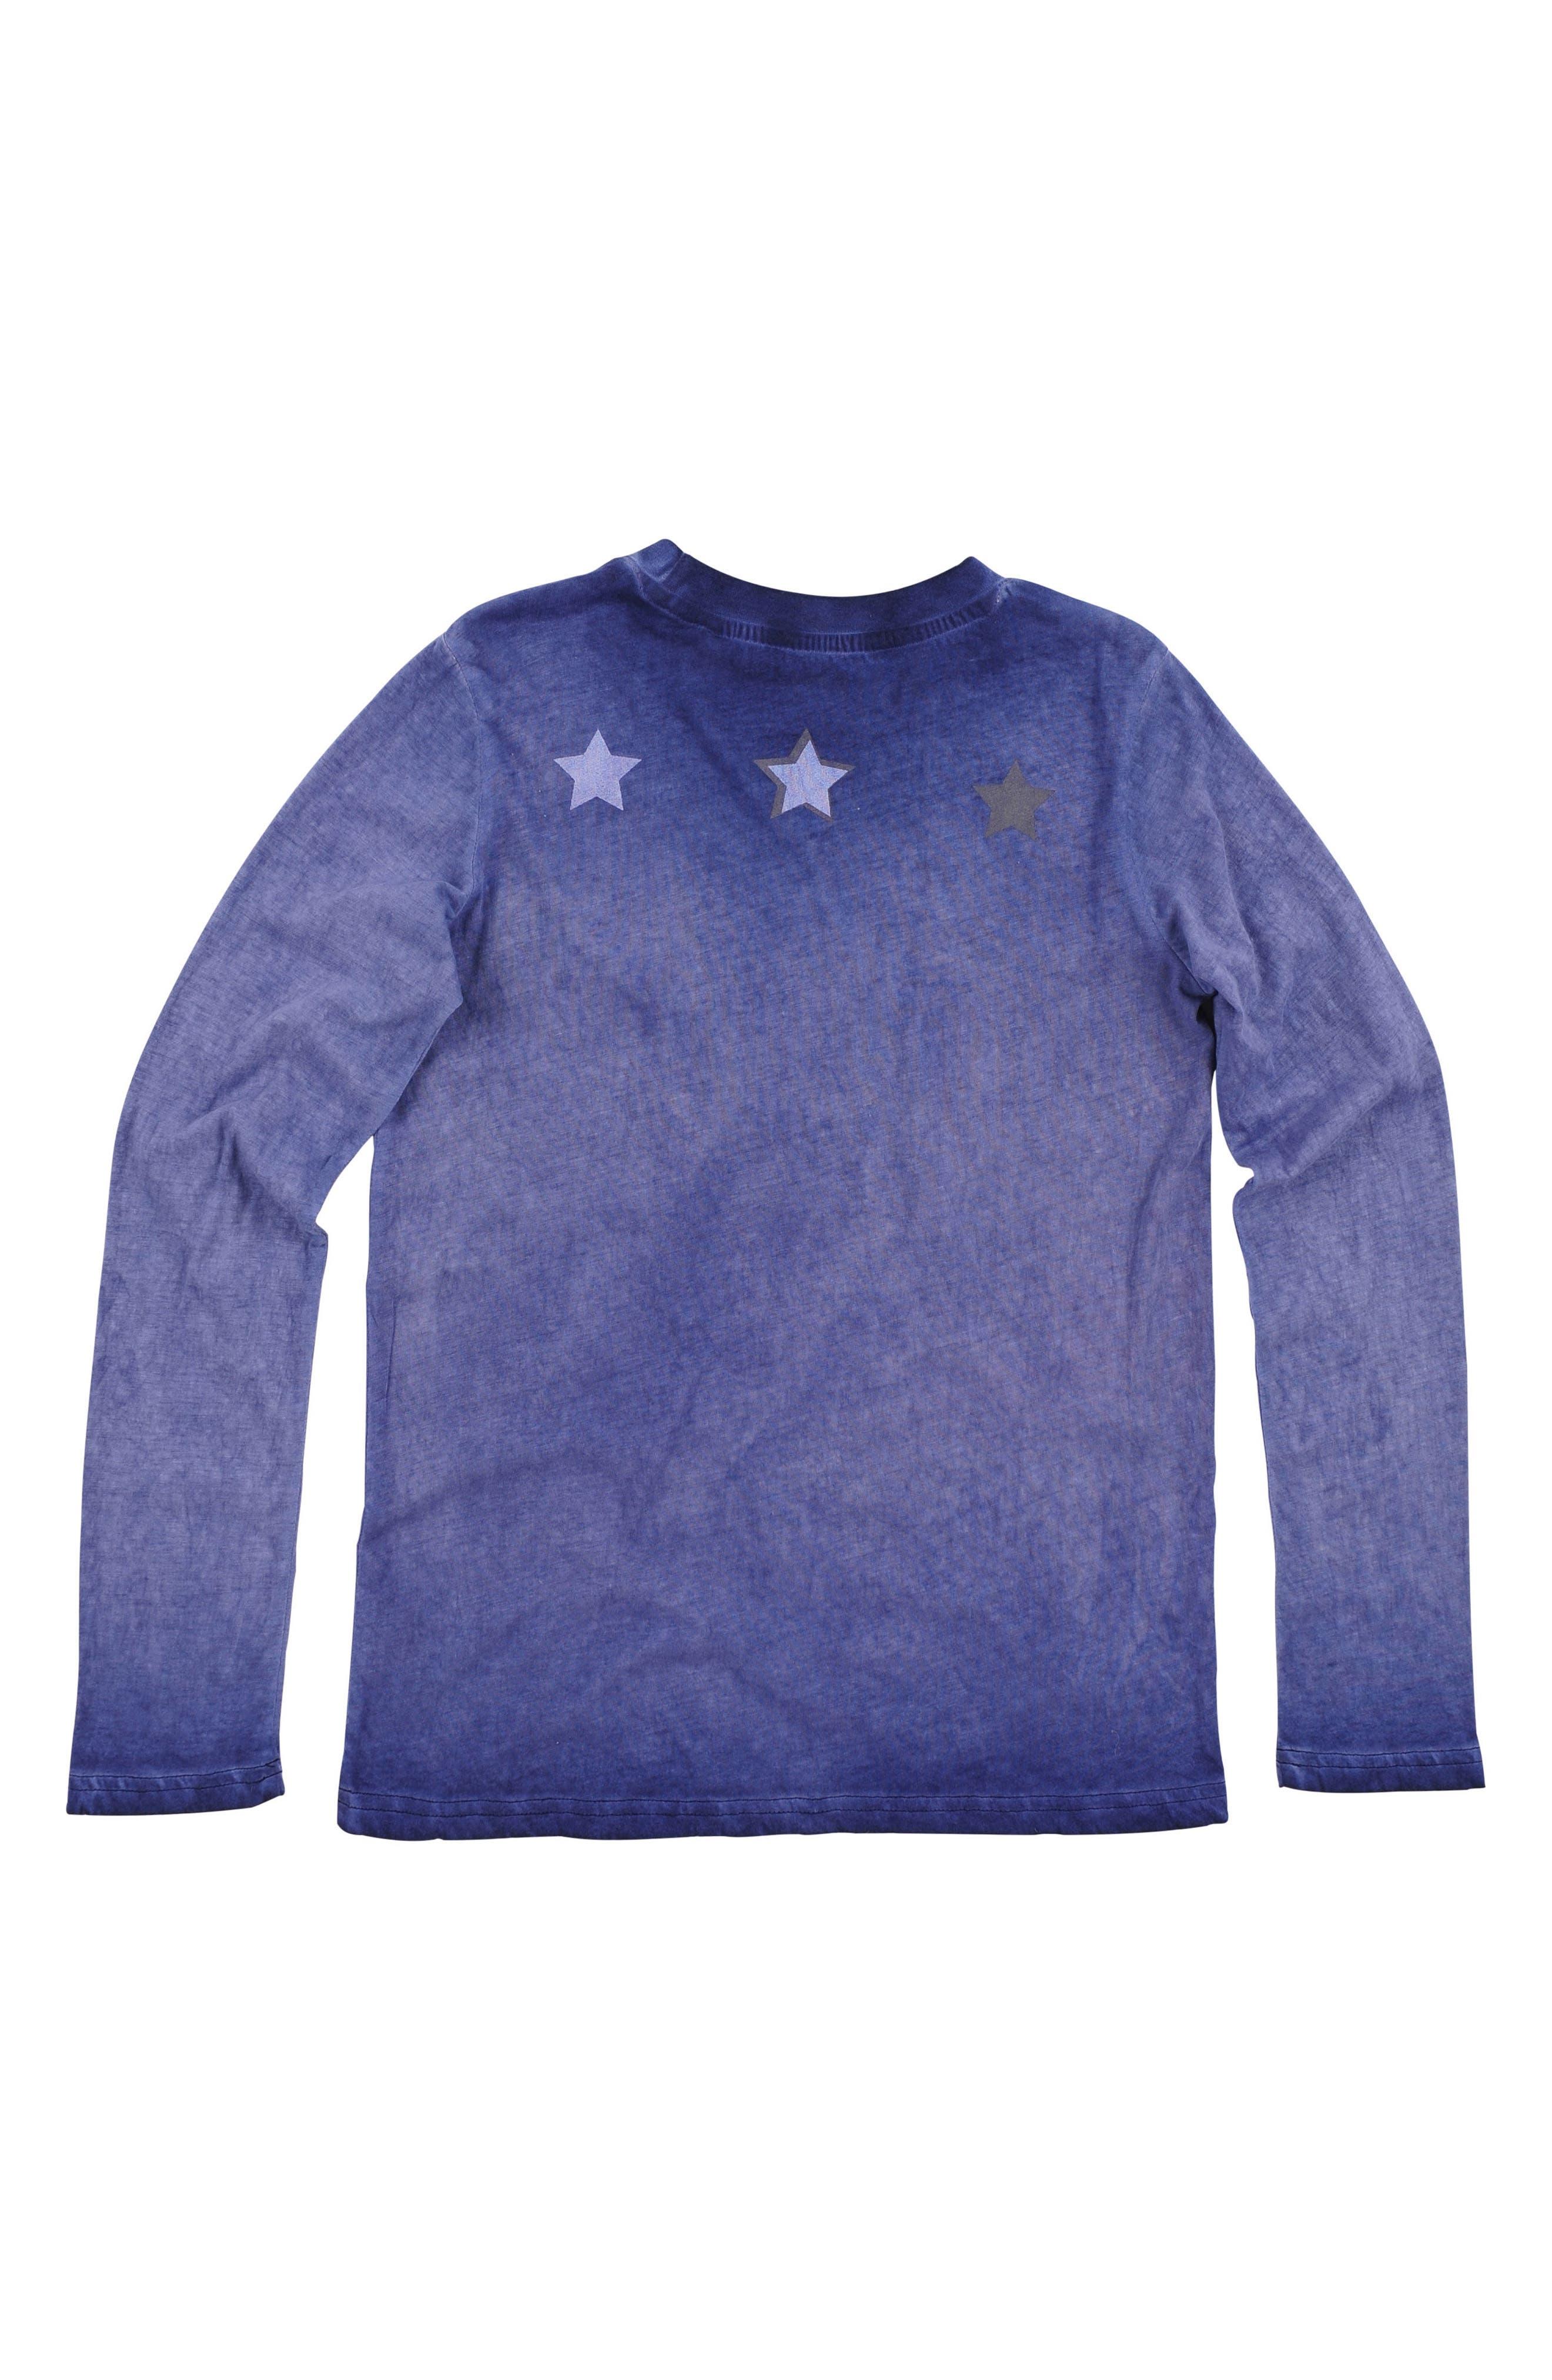 Give Me Space Long Sleeve T-Shirt,                             Main thumbnail 1, color,                             401